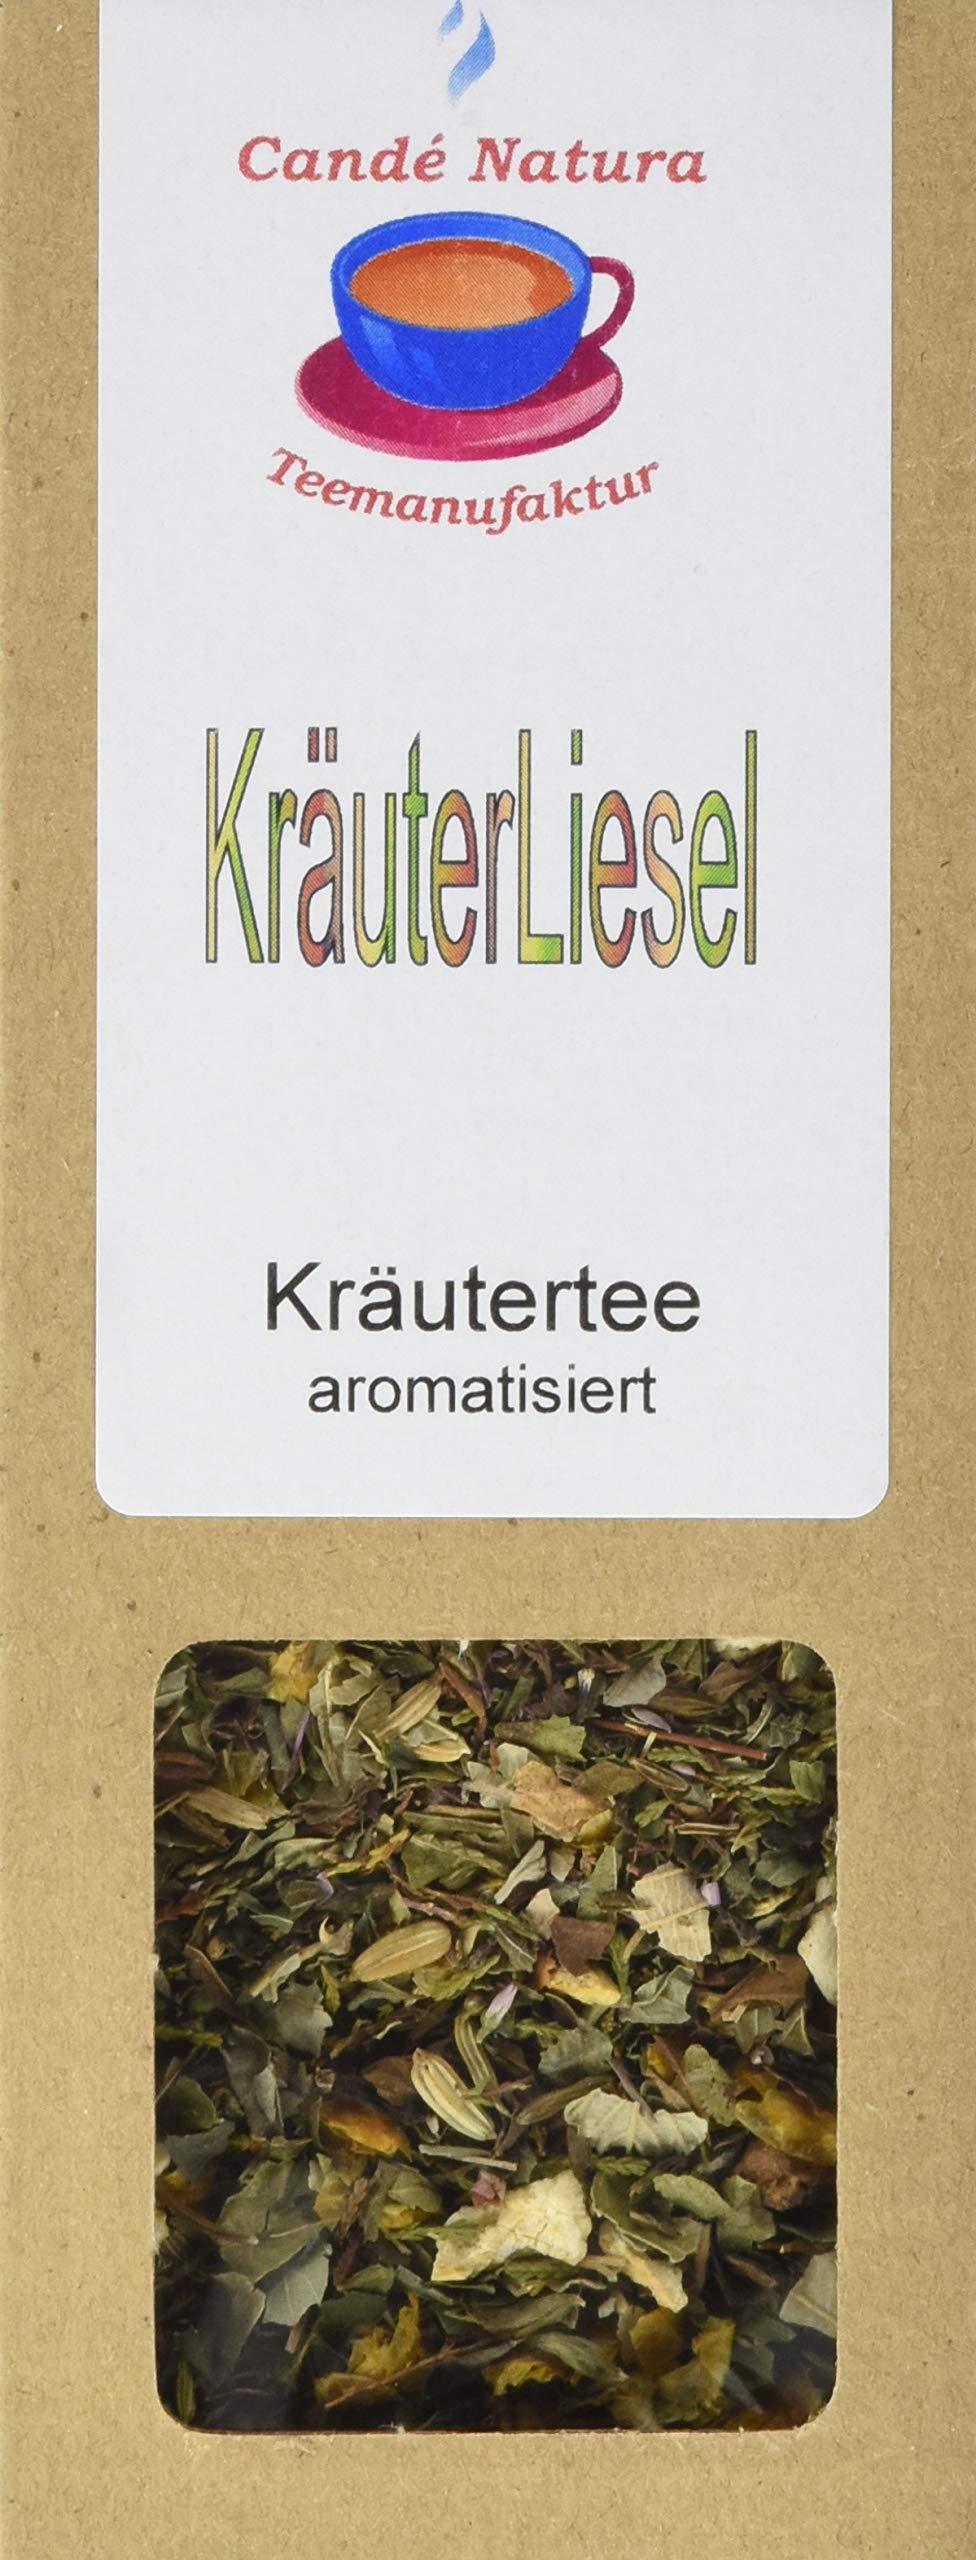 Cand-Natura-Teemanufaktur-Kraeuterliesel-Kruterteemischung-aromatisiert-5er-Pack-5-x-50-g